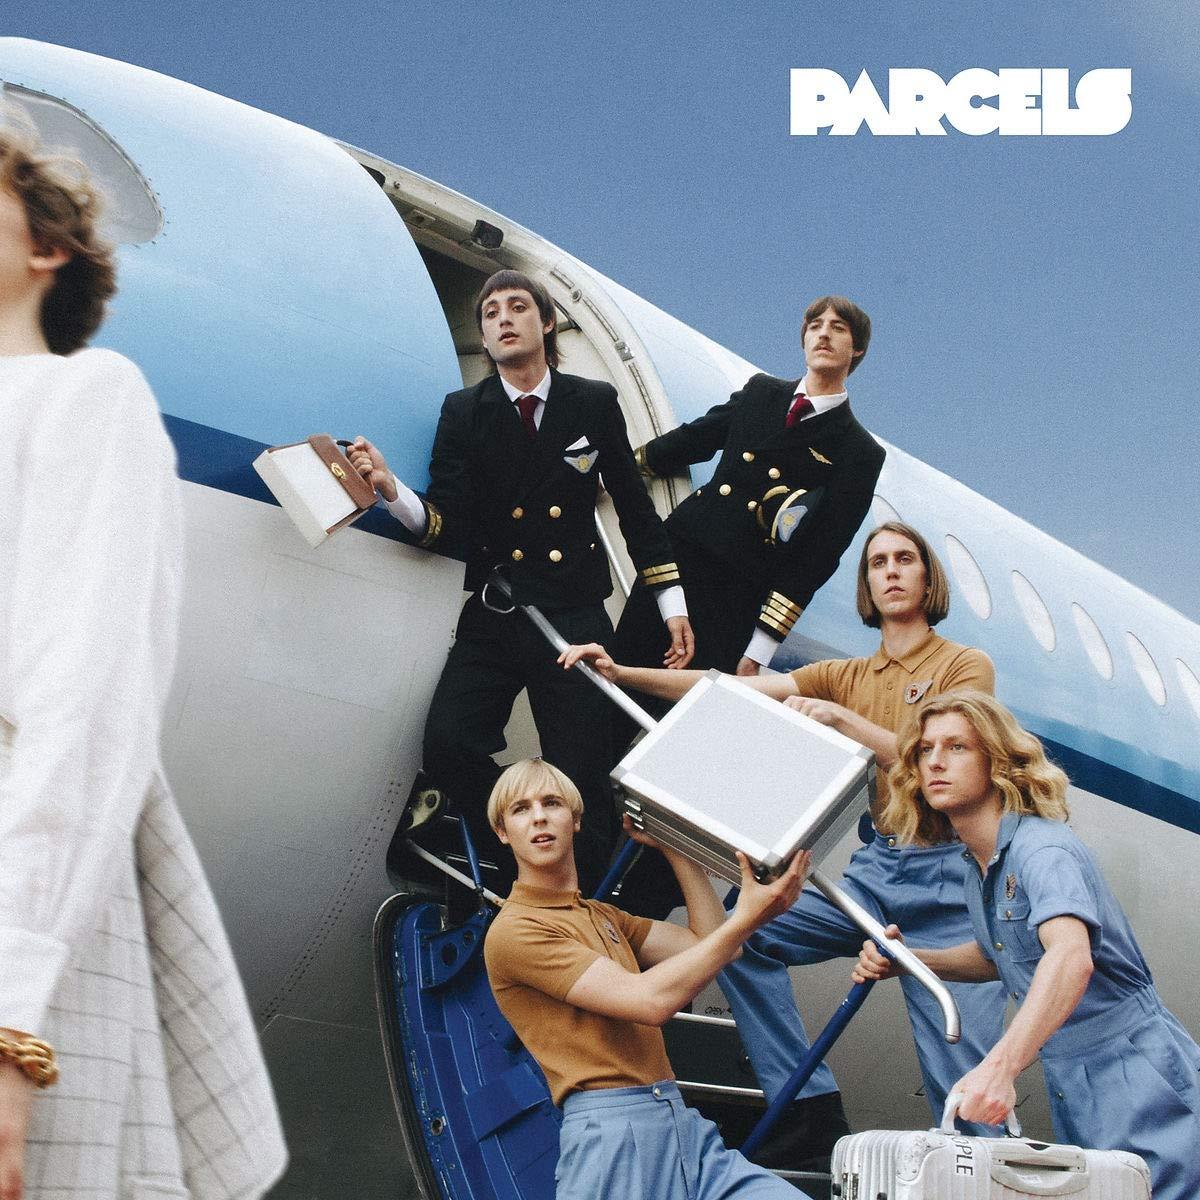 CD : Parcels - Parcels (CD)